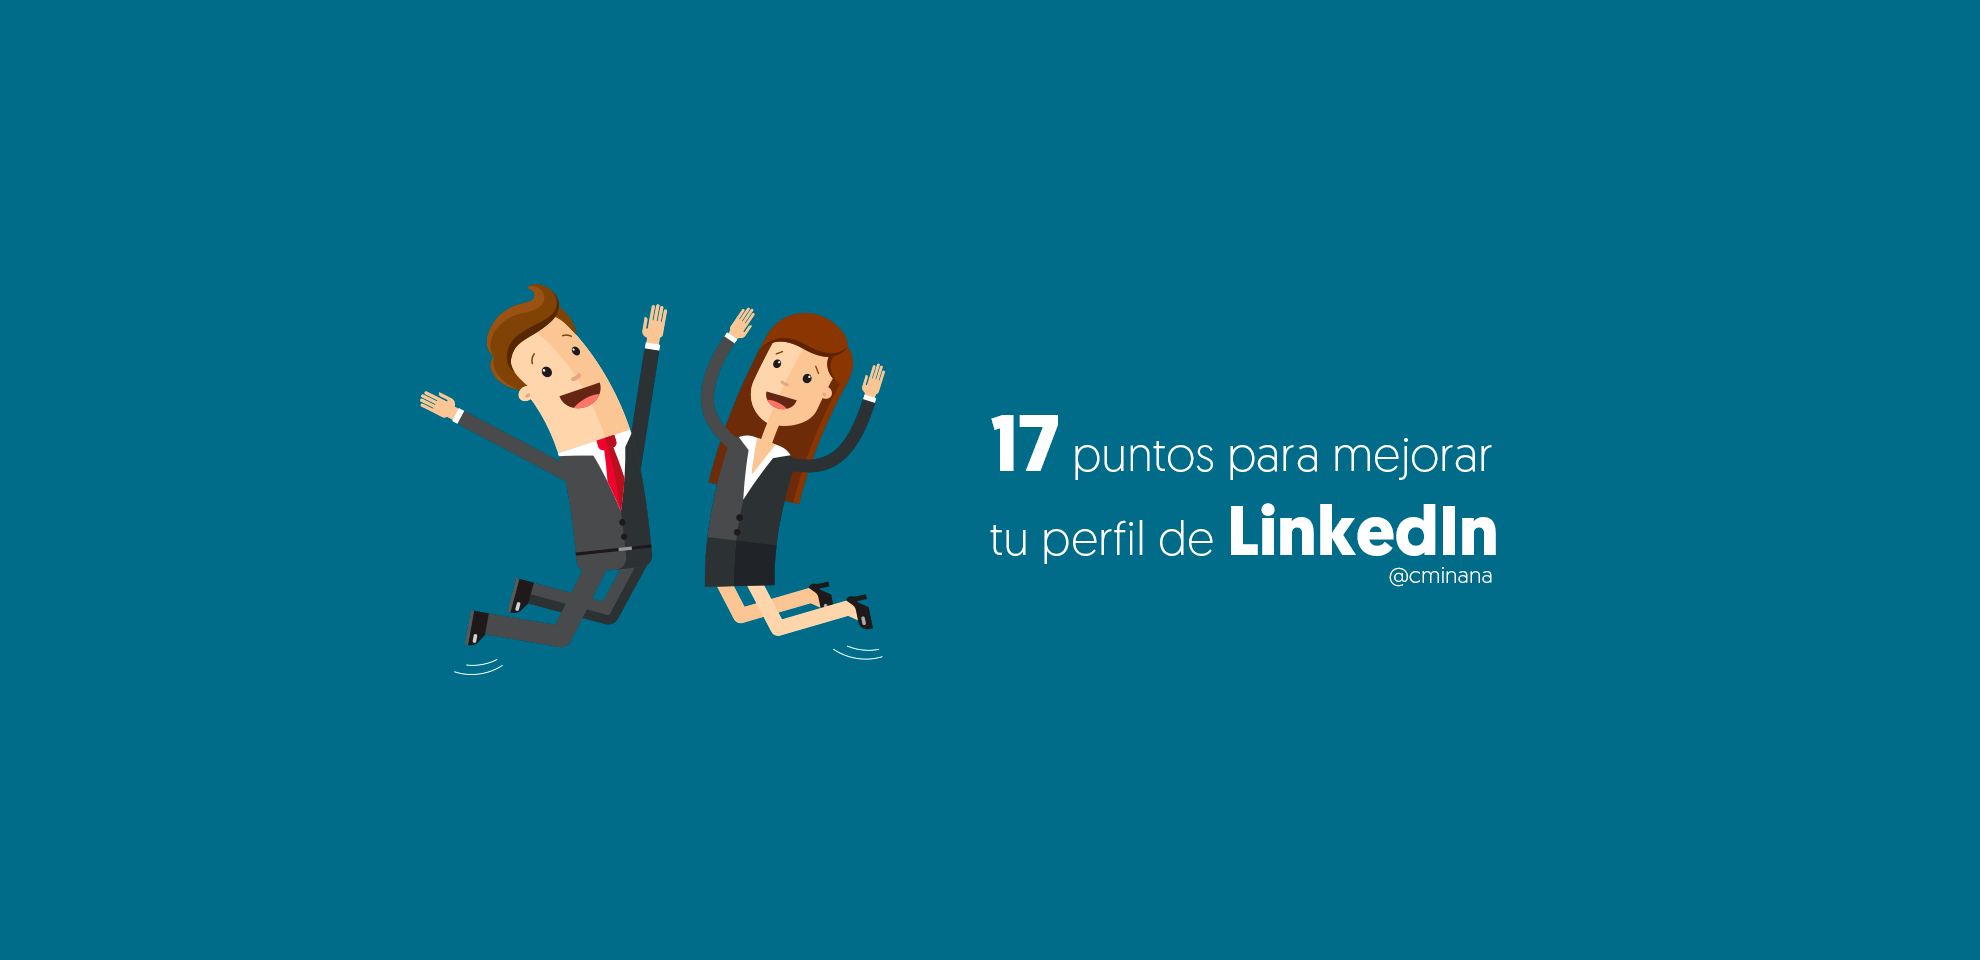 perfil de LinkedIn España